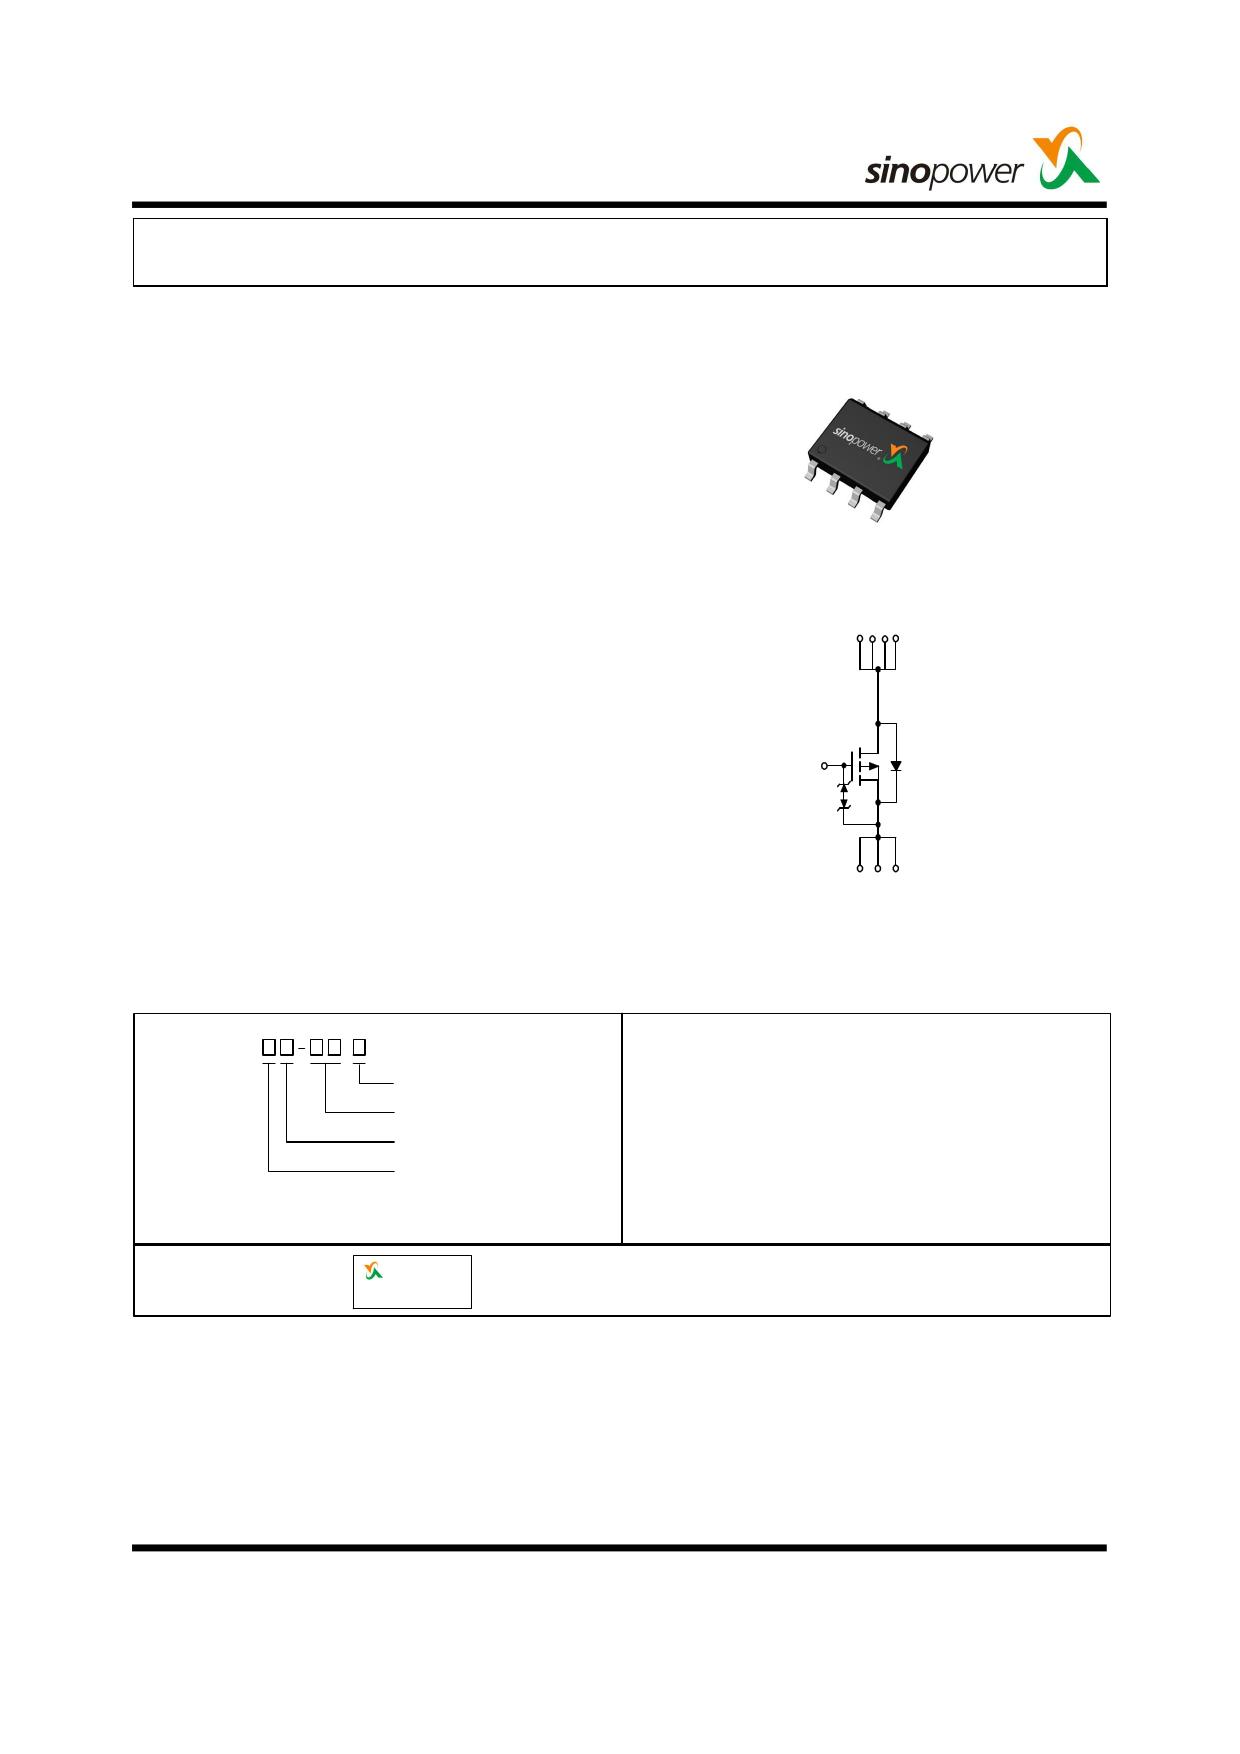 SM9435PSK datasheet pinout pdf